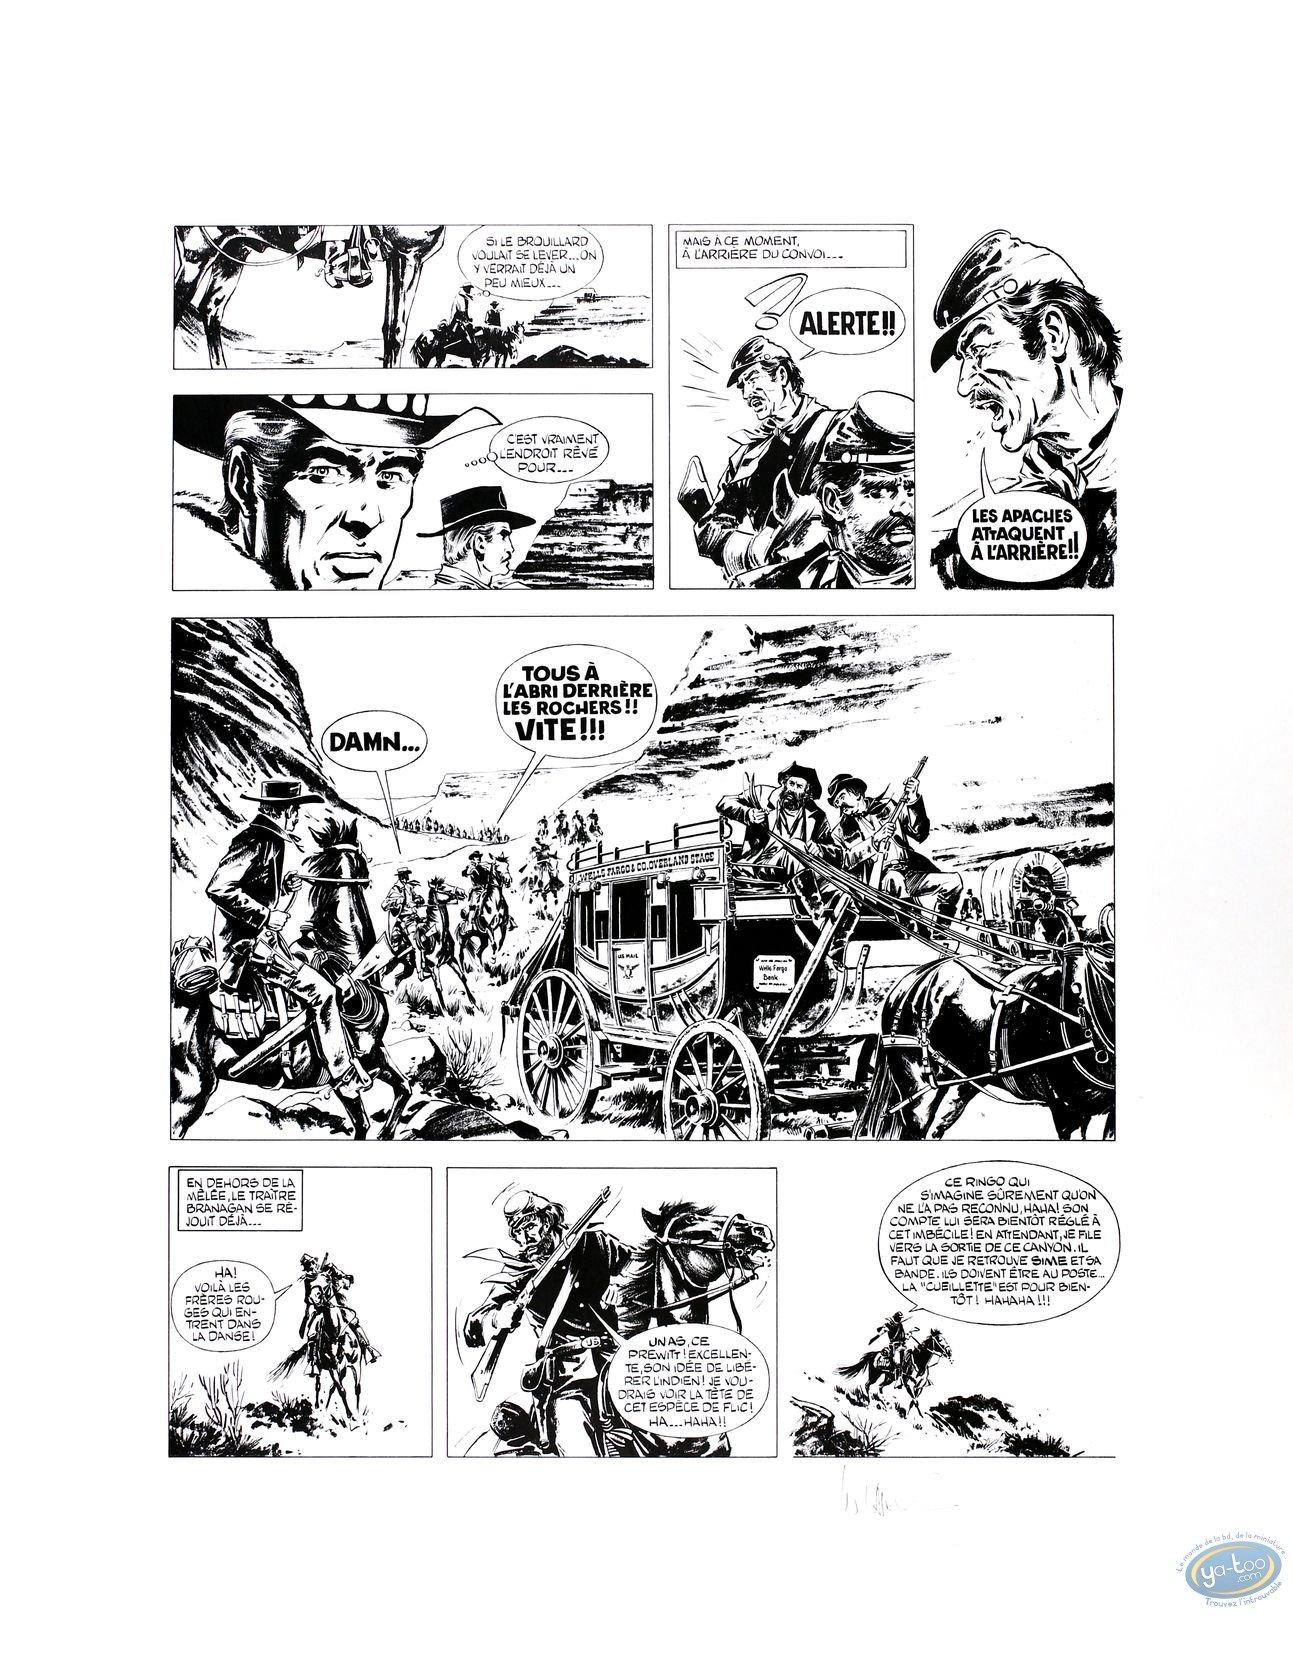 Offset Print, Ringo : William Vance : page 5 : Ringo 3